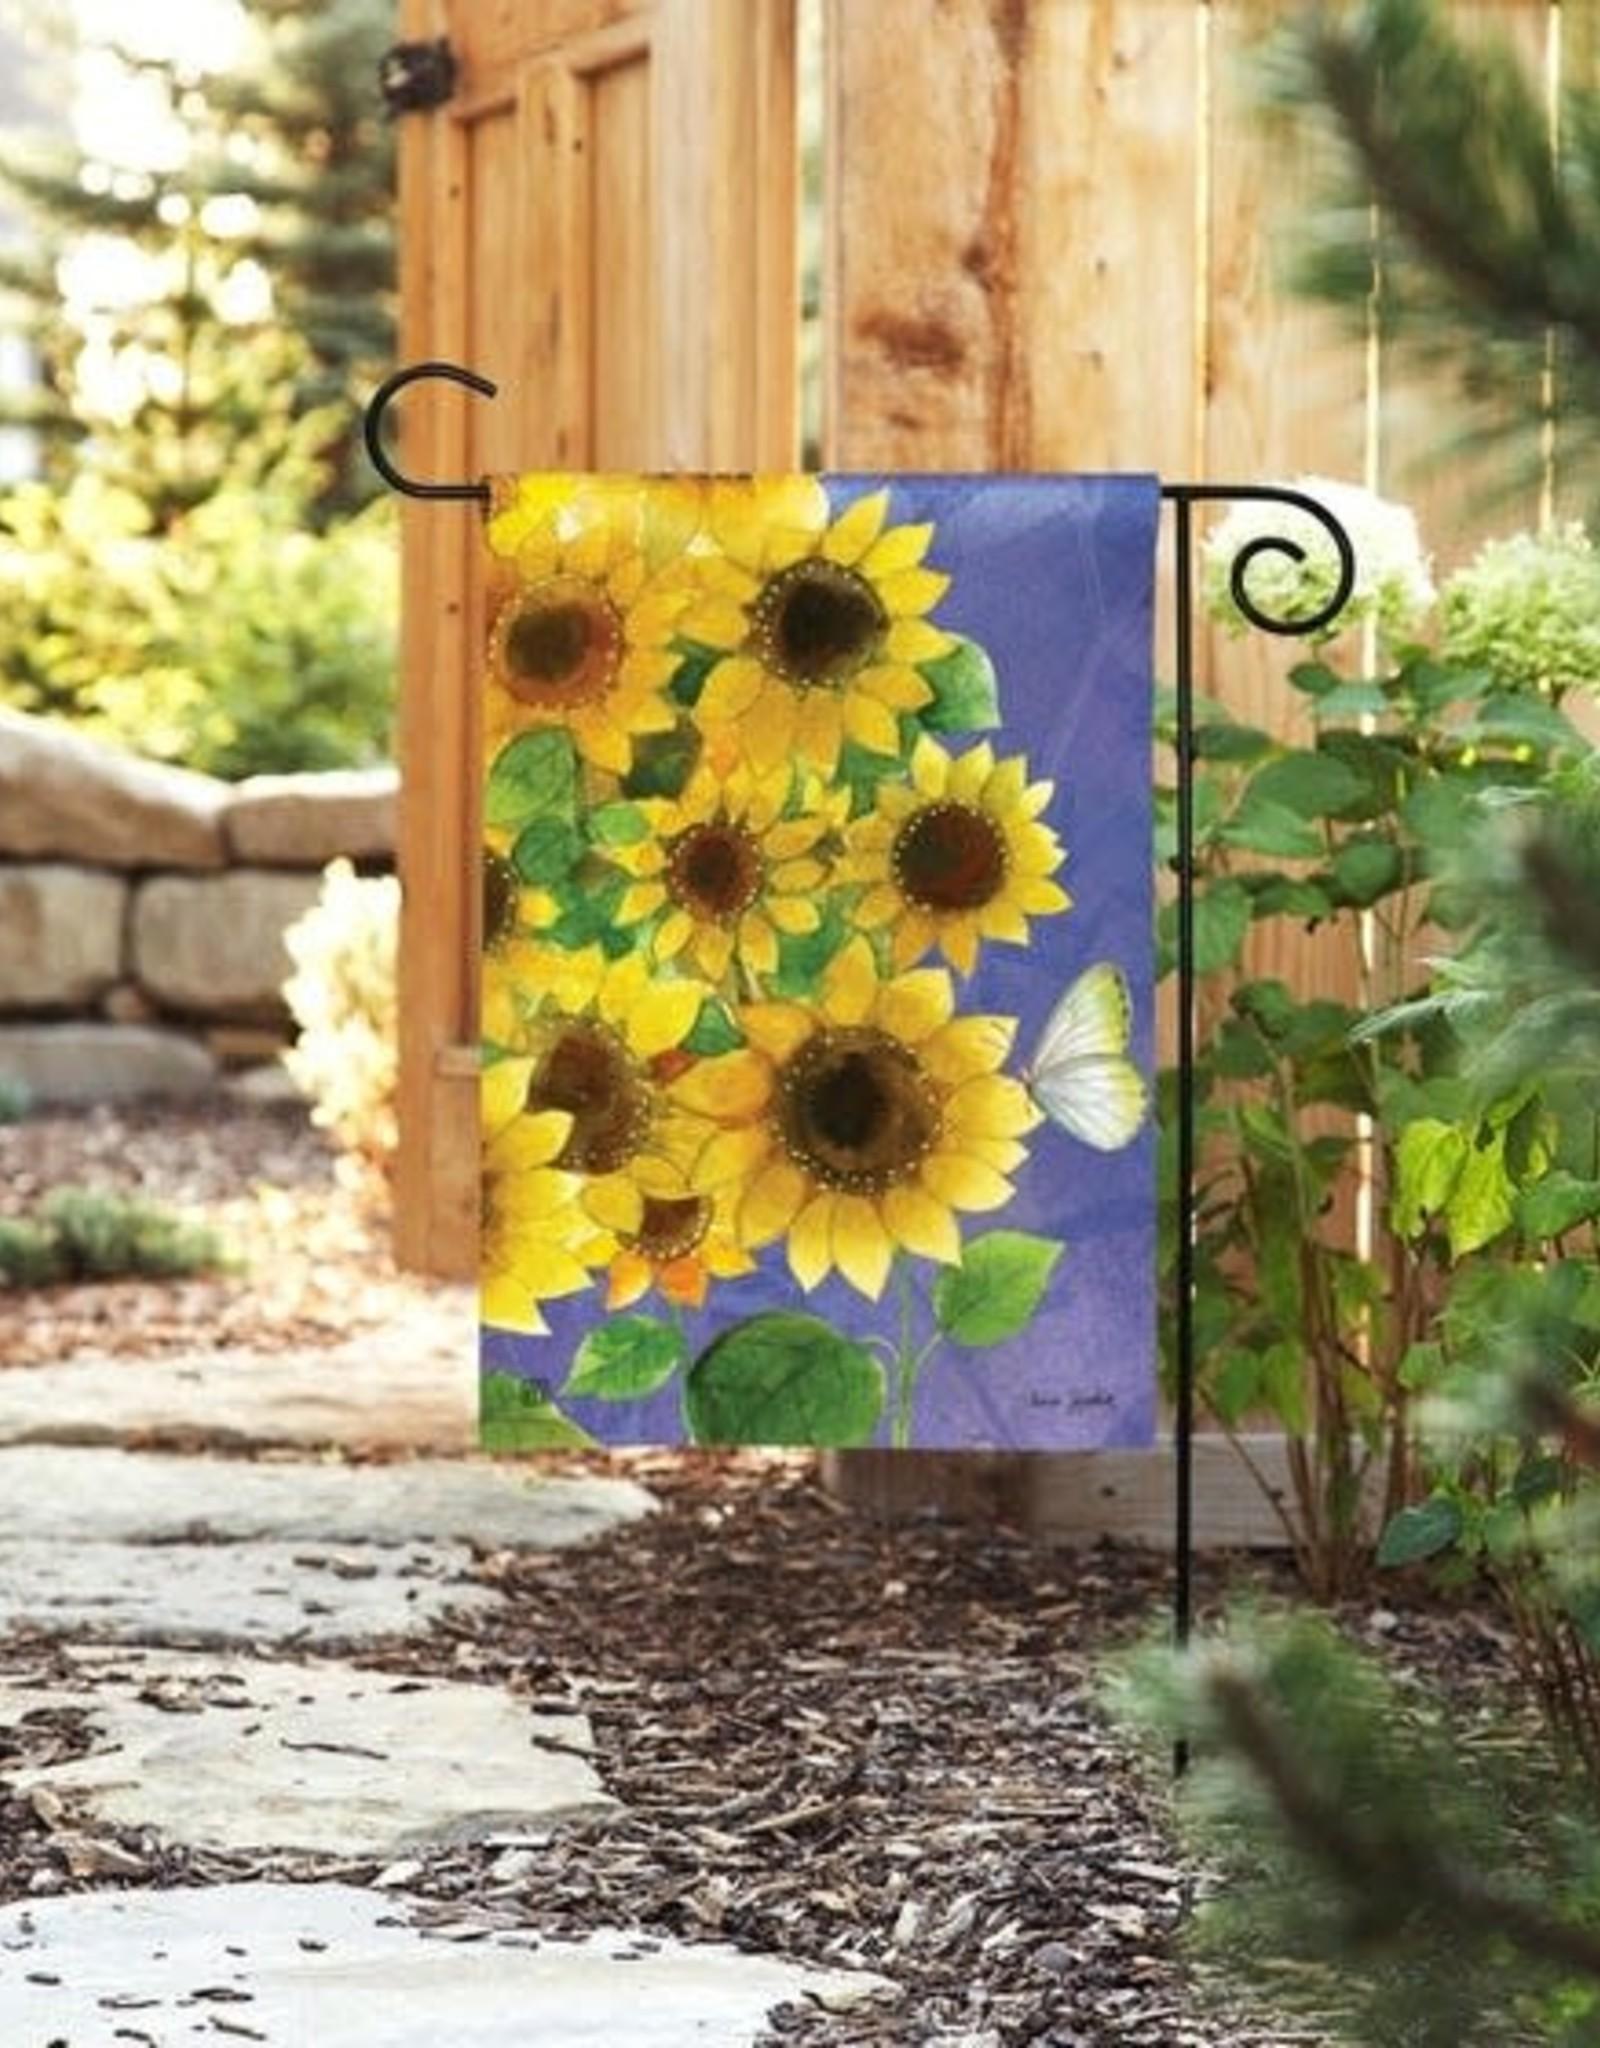 Studio M GF Sunflowers on Blue